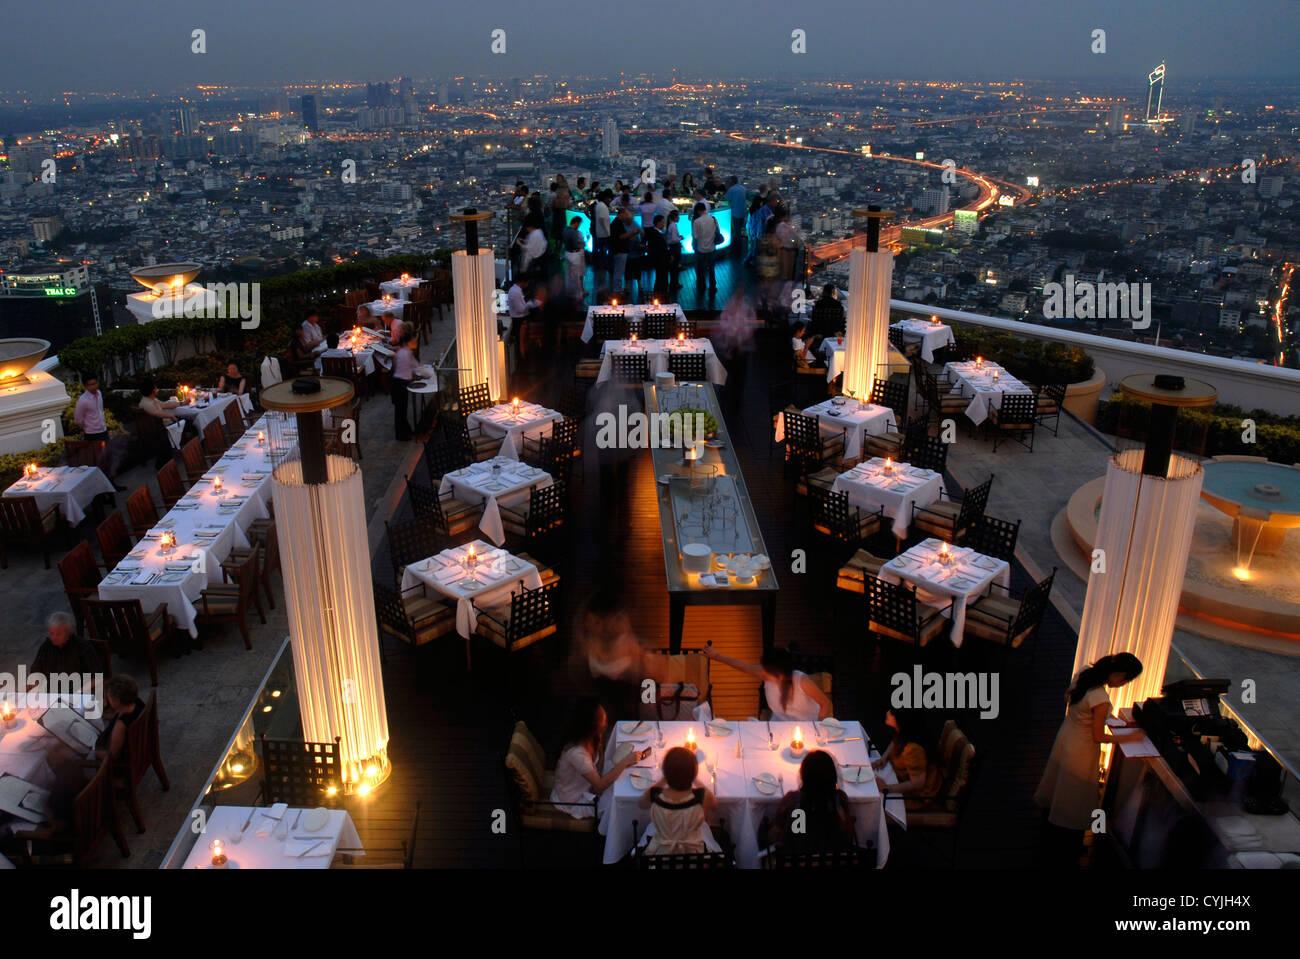 Restaurant, Sirocco, Dome,  State Tower. Bangkok, Sky Bar, Sight,  Thailand,  Asia, - Stock Image